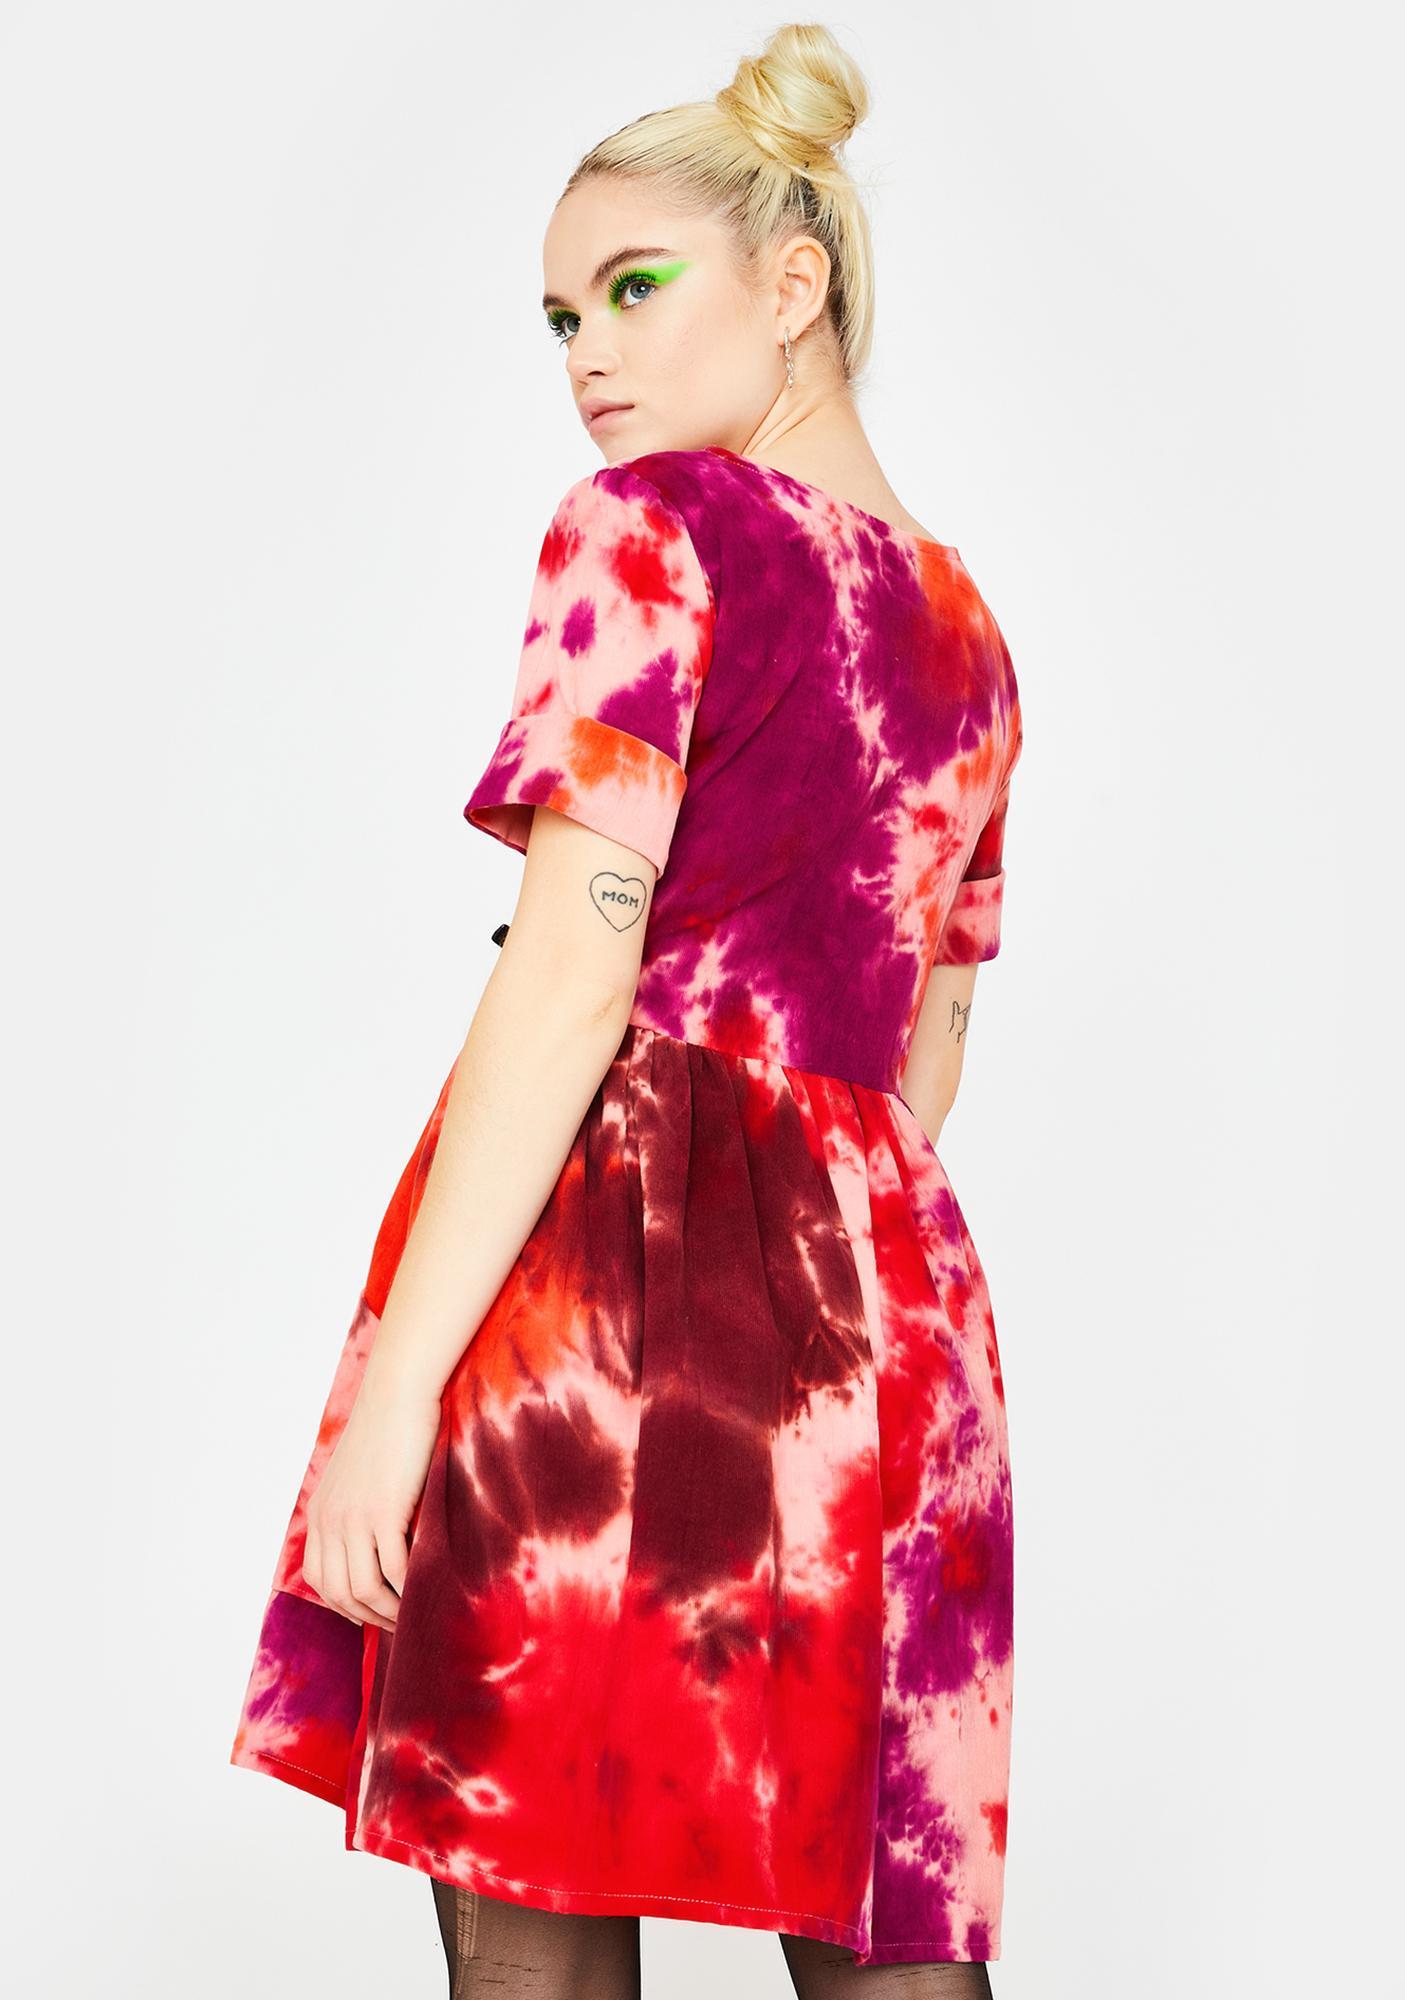 Tallulah's Threads Tie Dye Corduroy Dress